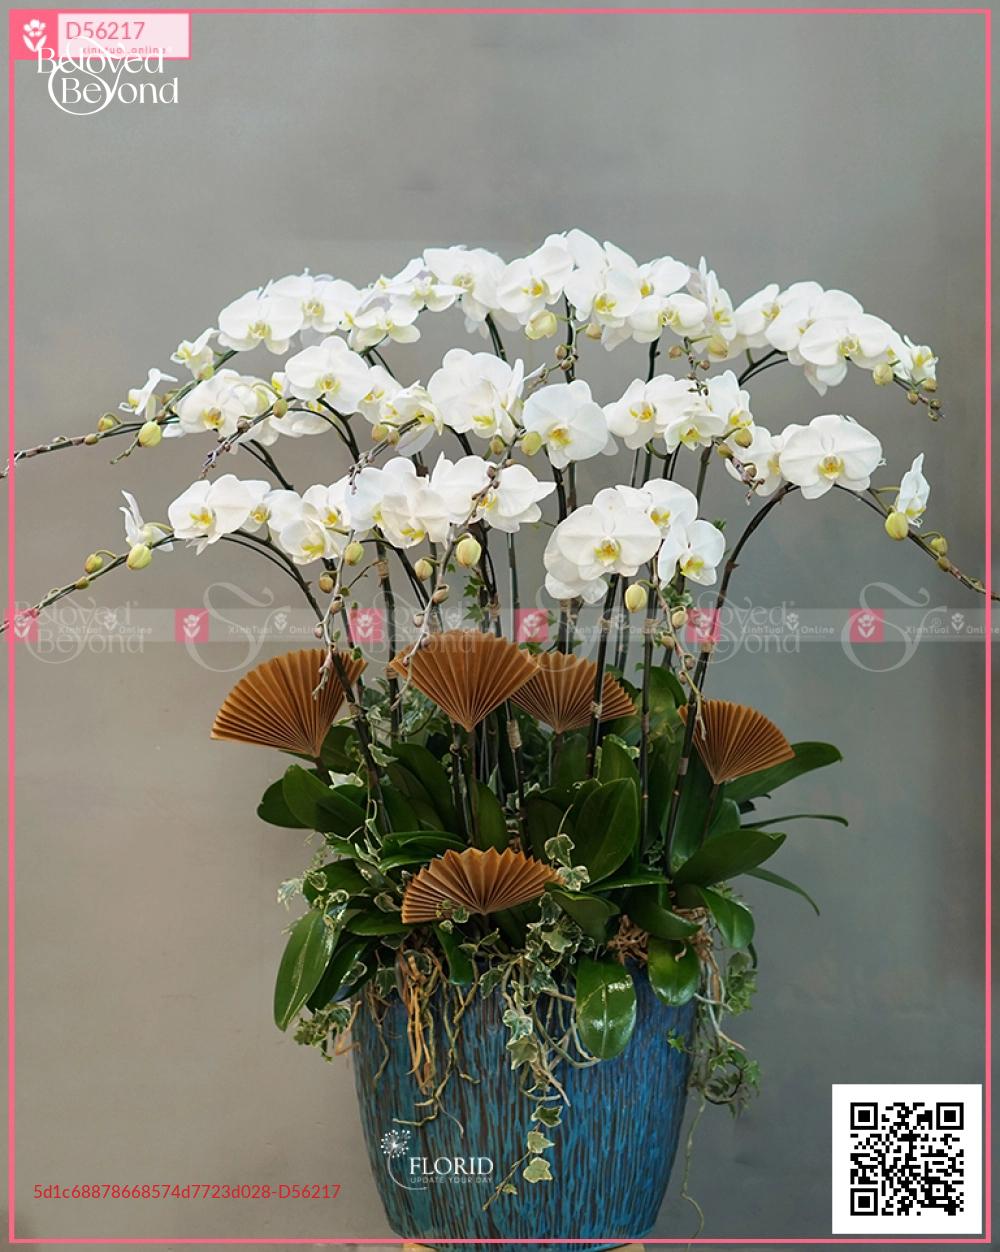 mã sp 1393 - D56217 - xinhtuoi.online